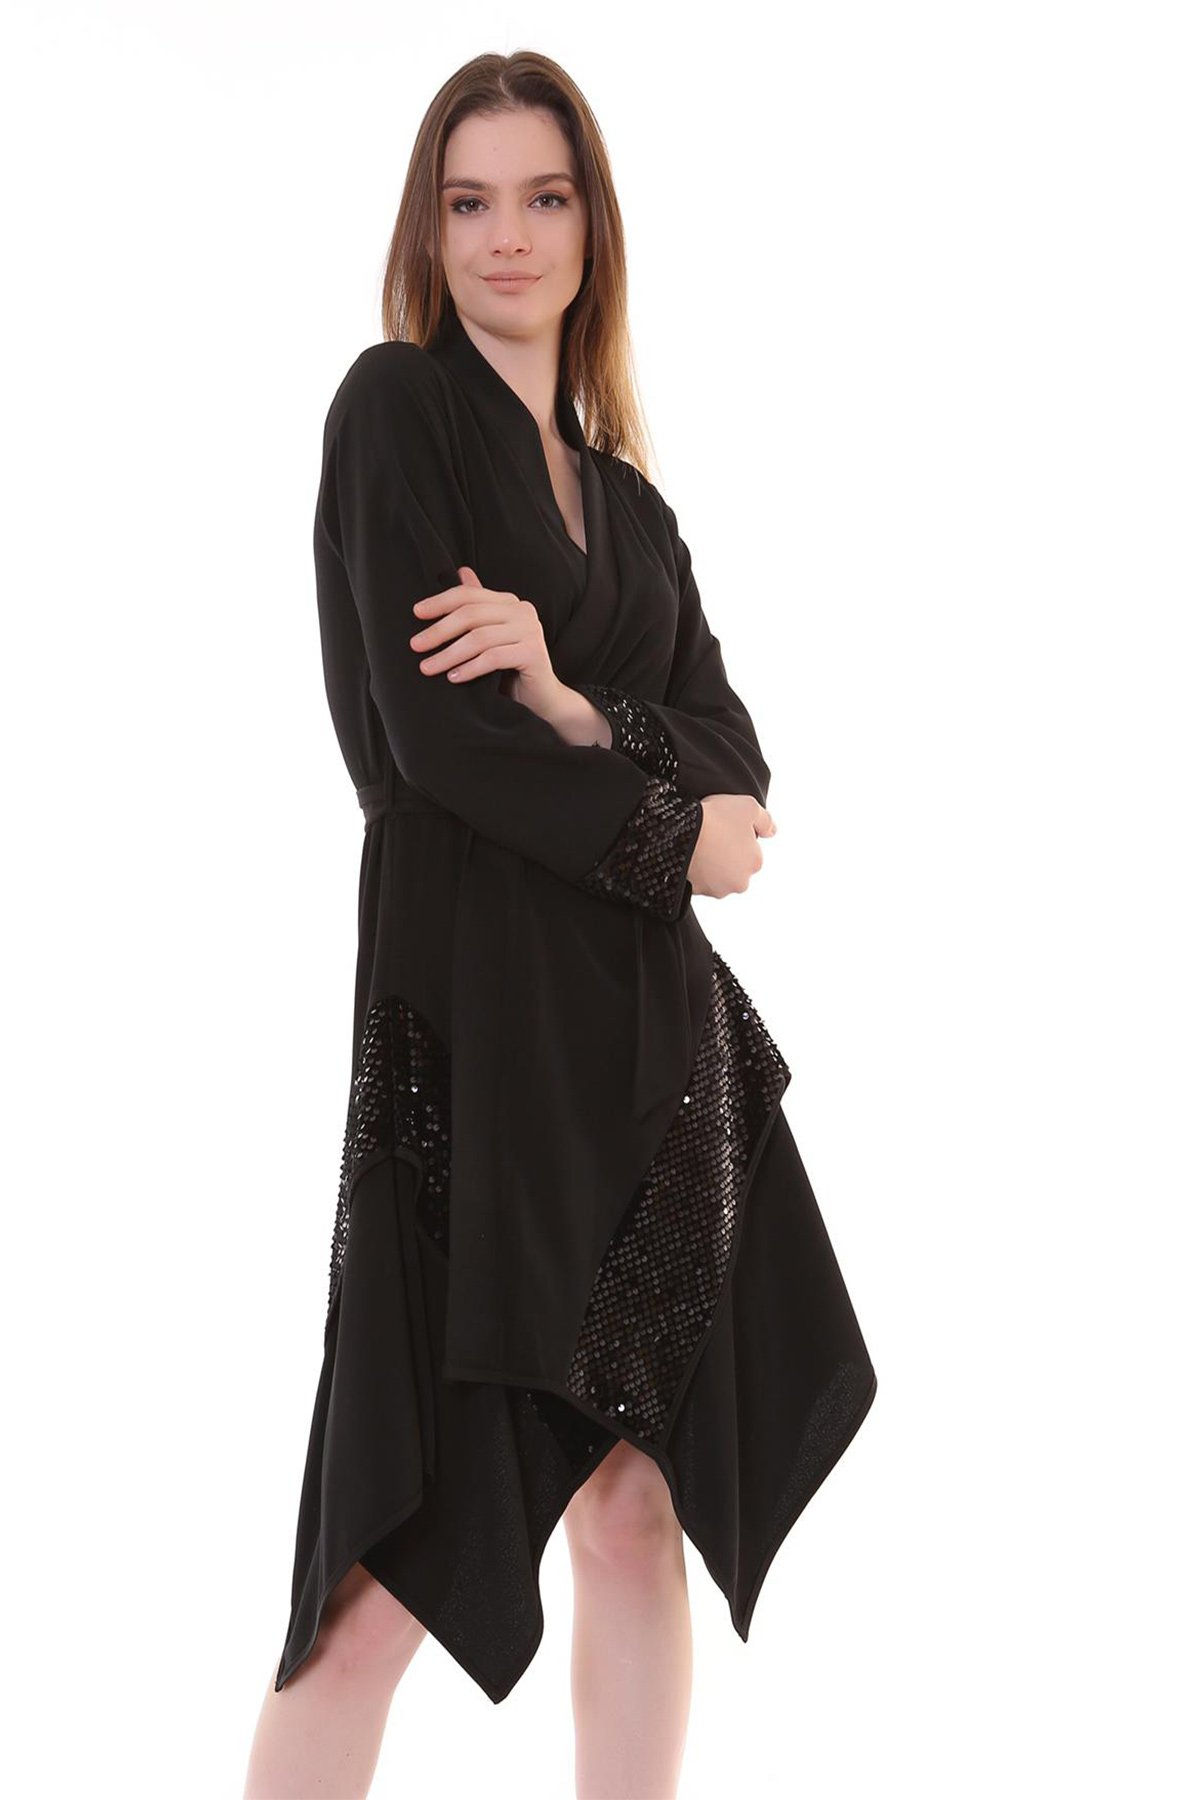 https://resim.oddamoda.com/p004009/siyah/elbise-6121-machek-08710-4477.jpg